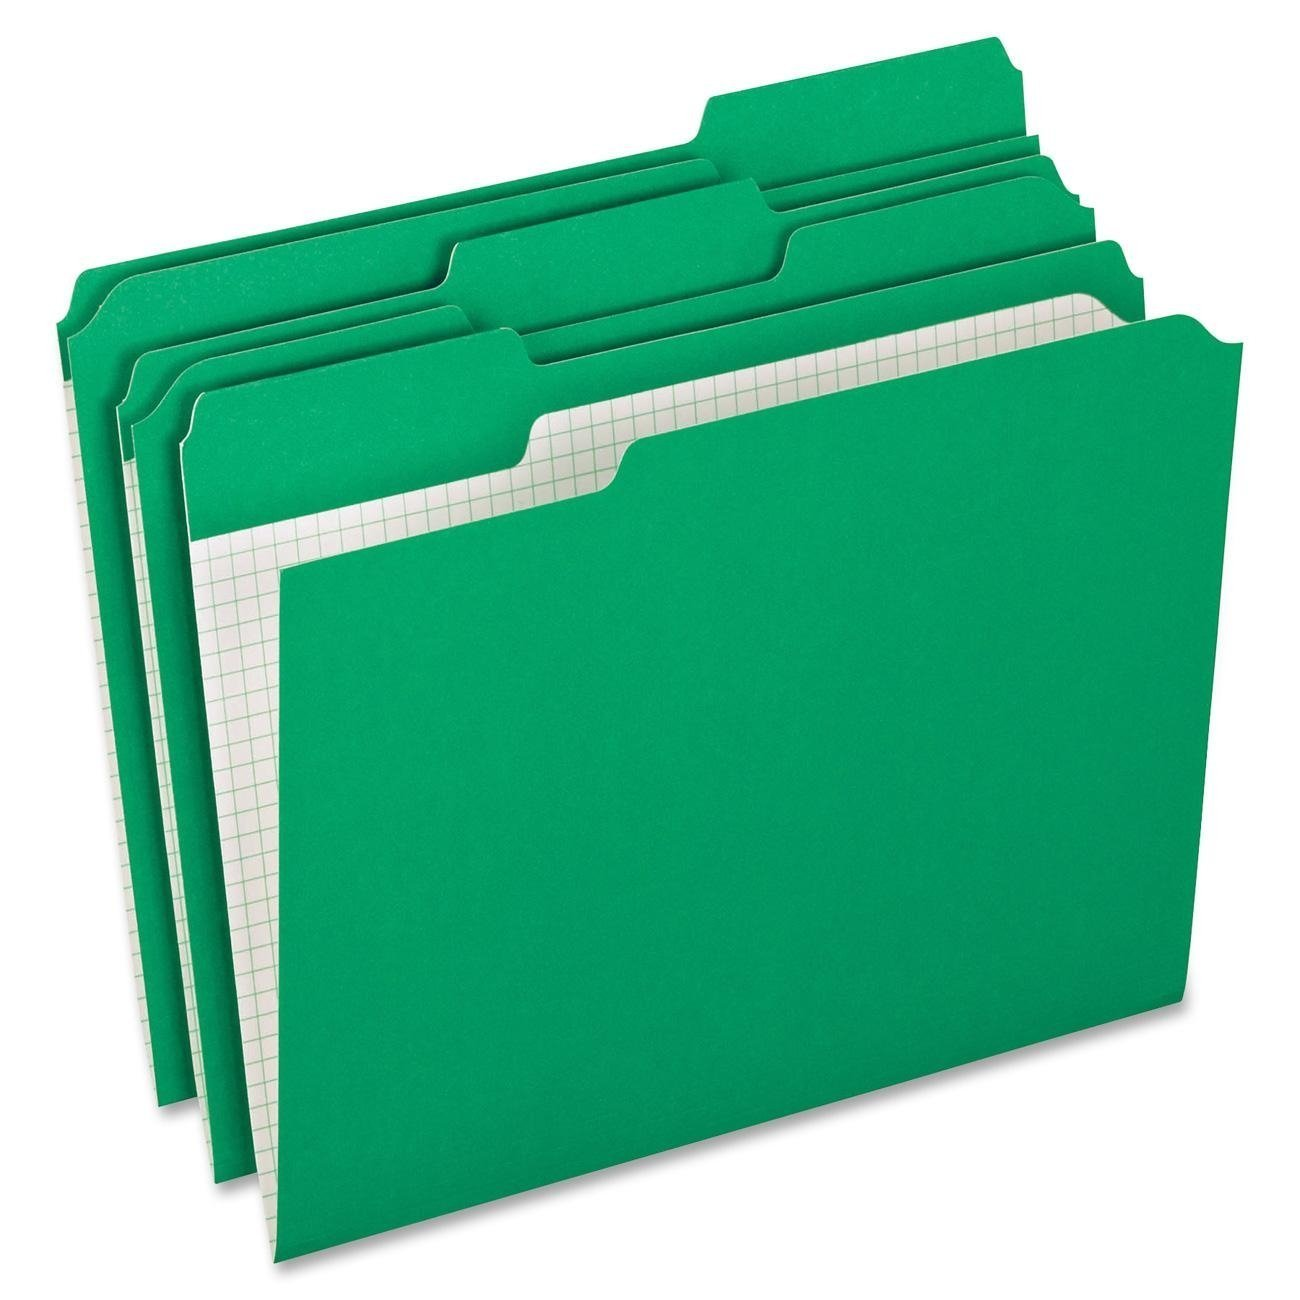 Pendaflex Top Tab Colored Folders, 100 per Box (PFXR152 1/3 BGR) 2-Pack Green